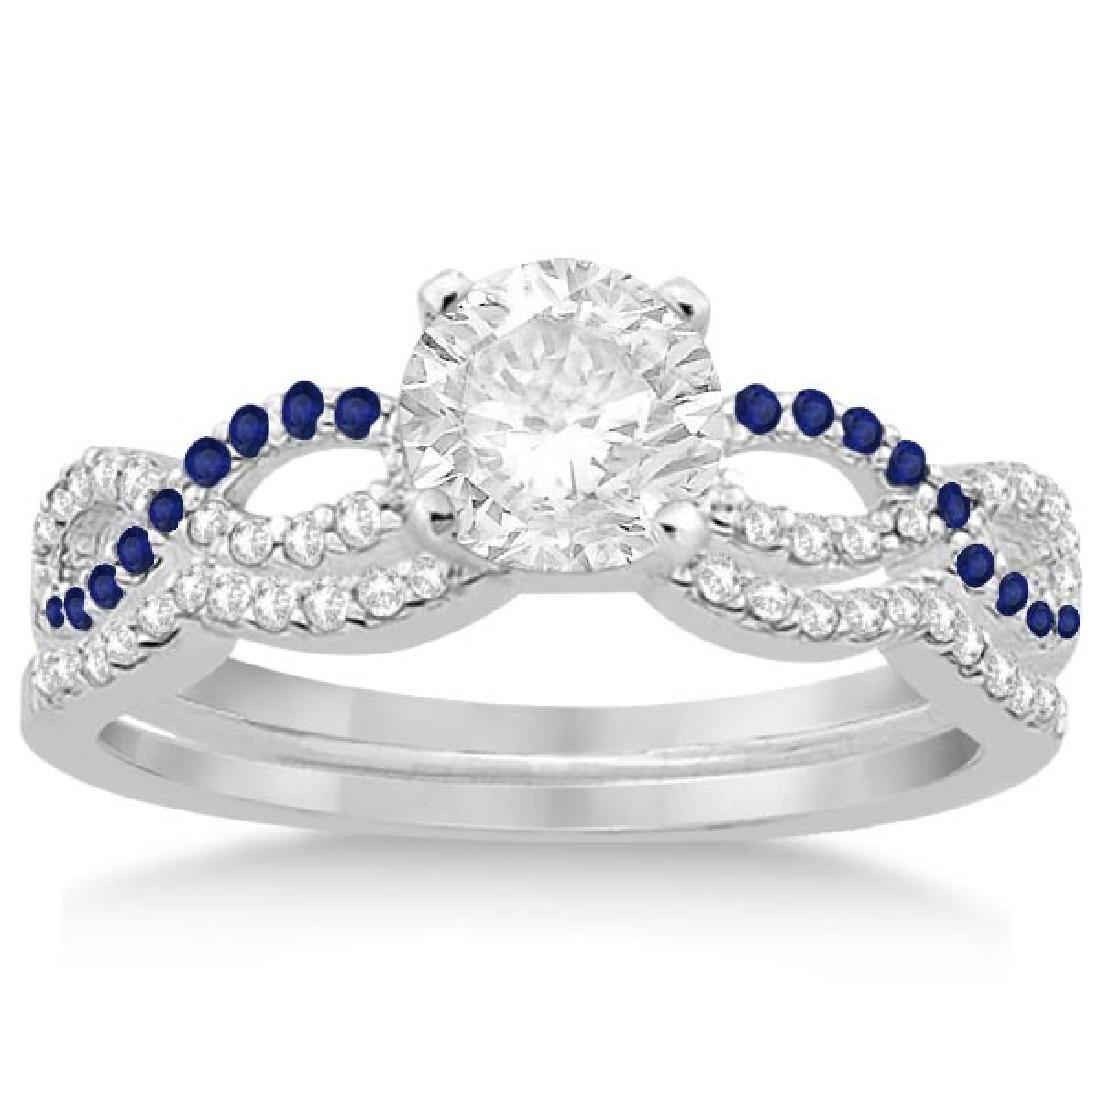 Infinity Diamond and Blue Sapphire Bridal Set 14K White